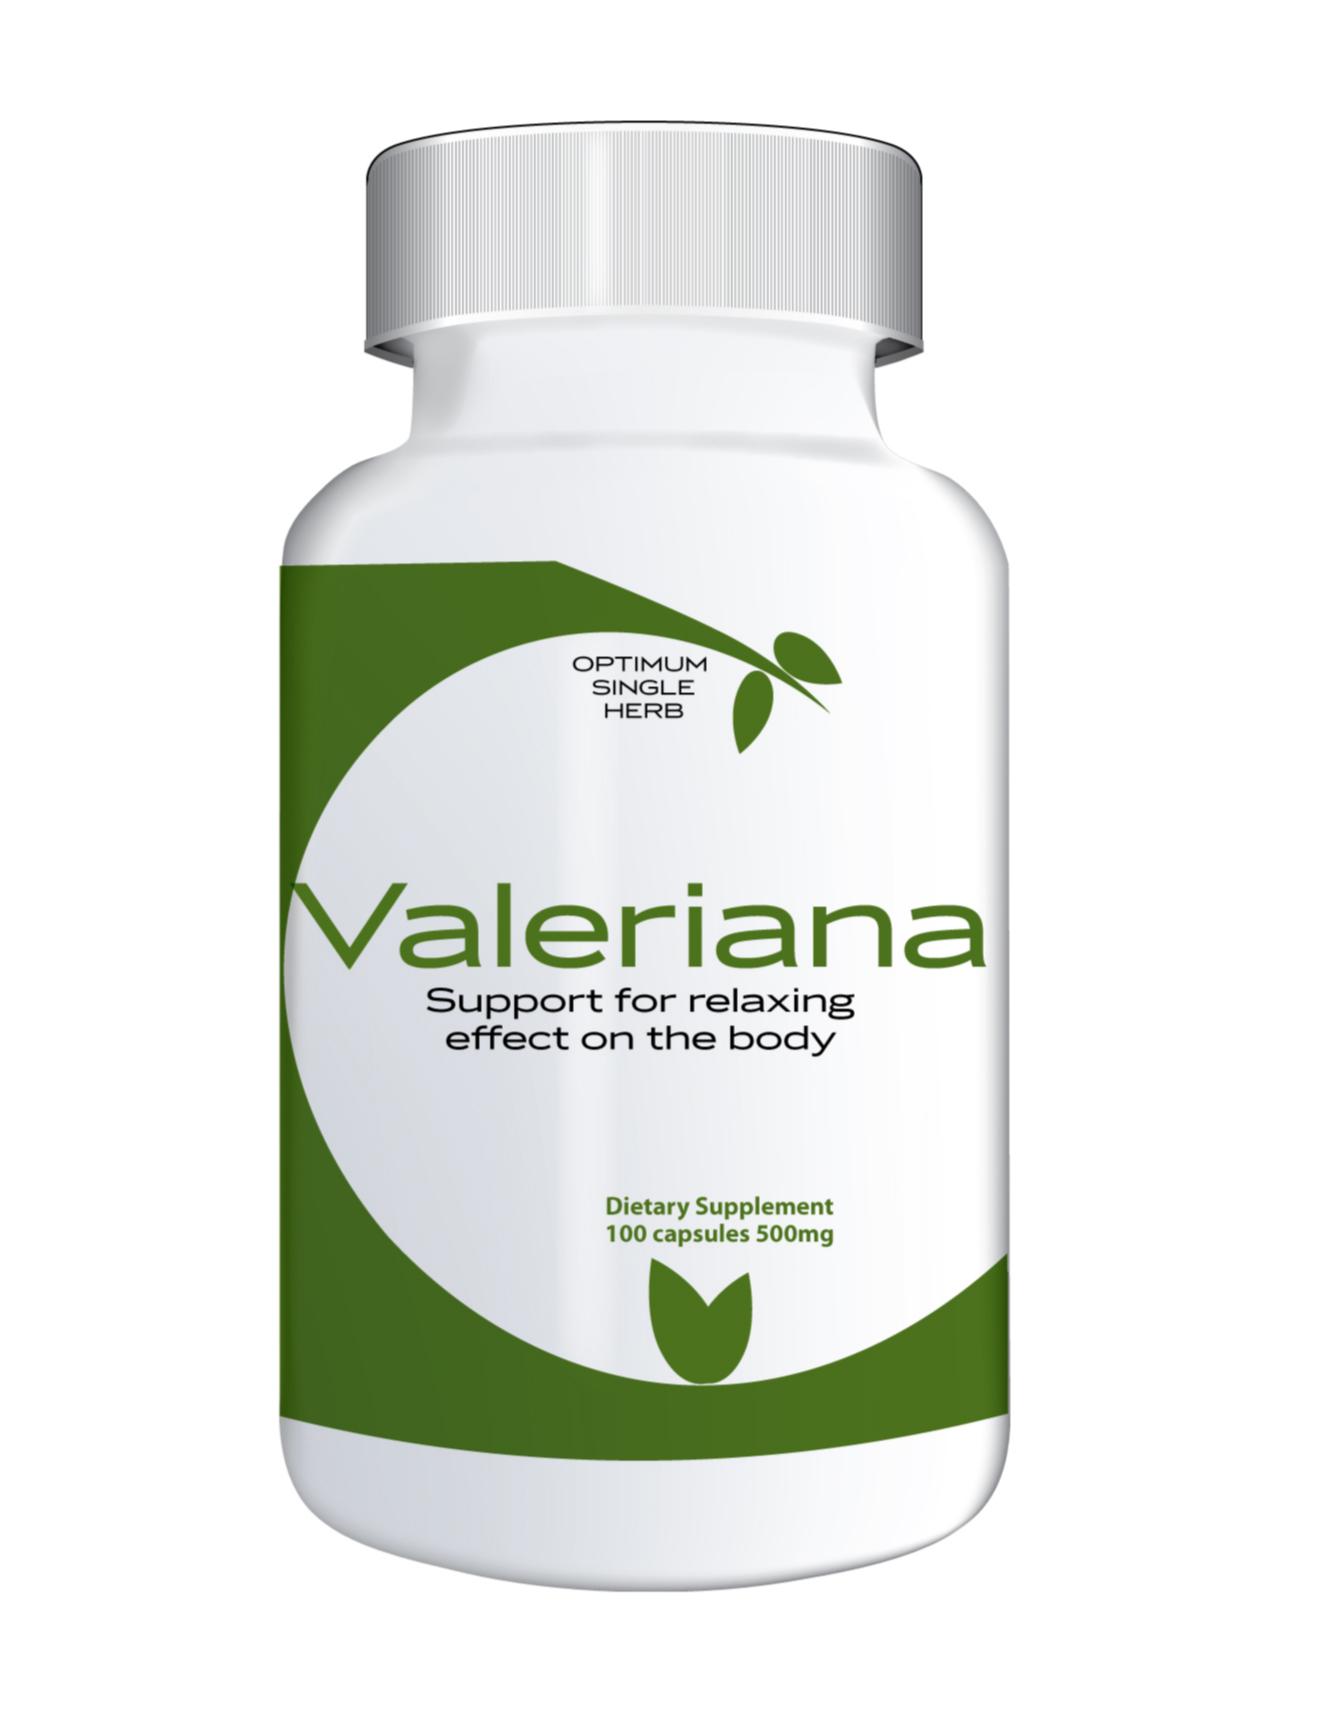 Valeriana 100 capsules 500mg